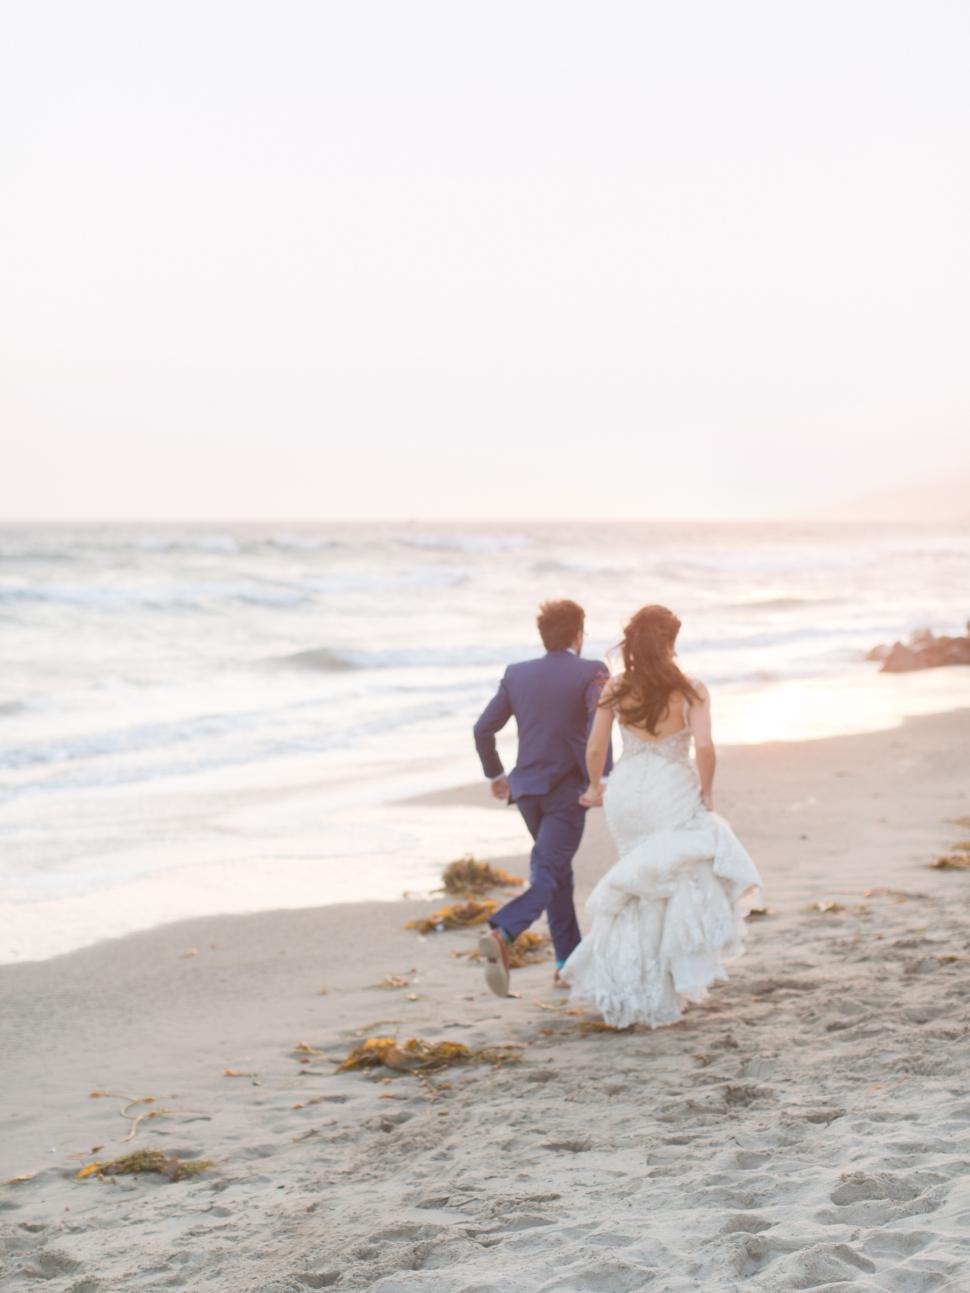 Malibu-Wedding-Photographer-Cassi-Claire-Malibu-West-Beach-Club-Wedding_20.jpg